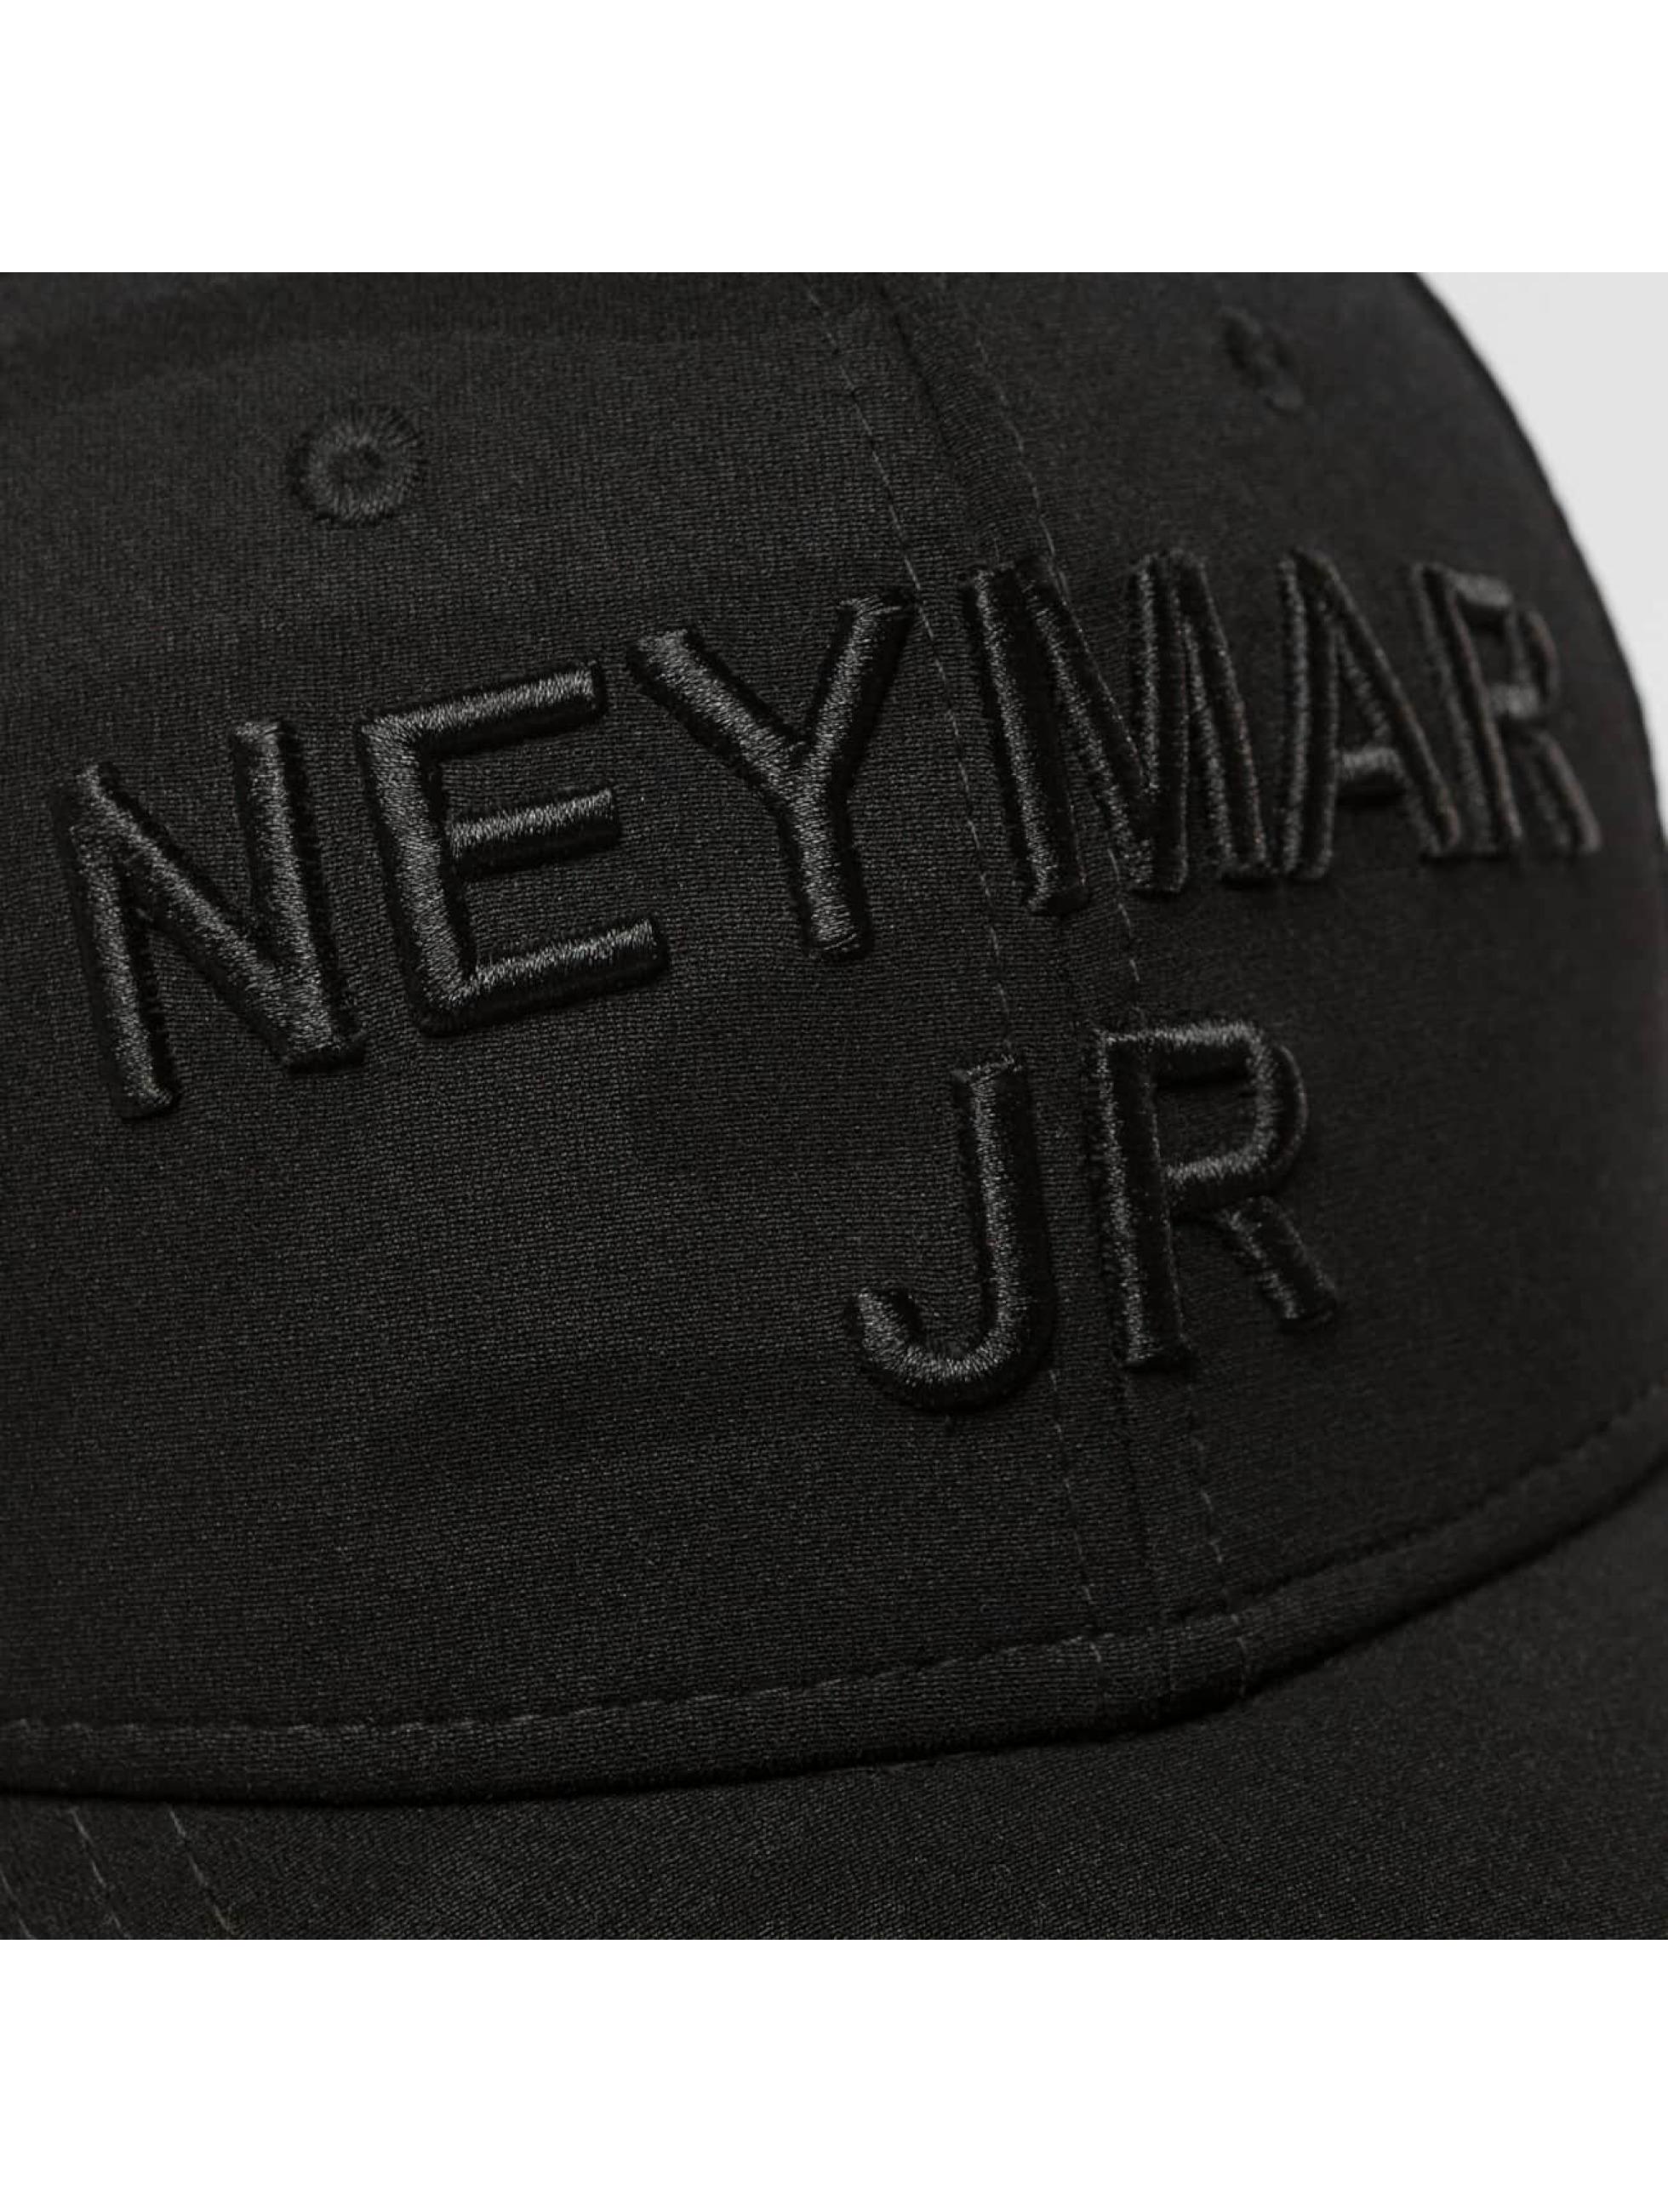 PSG by Dwen D. Corréa Casquette Snapback & Strapback Neymar Jr. noir